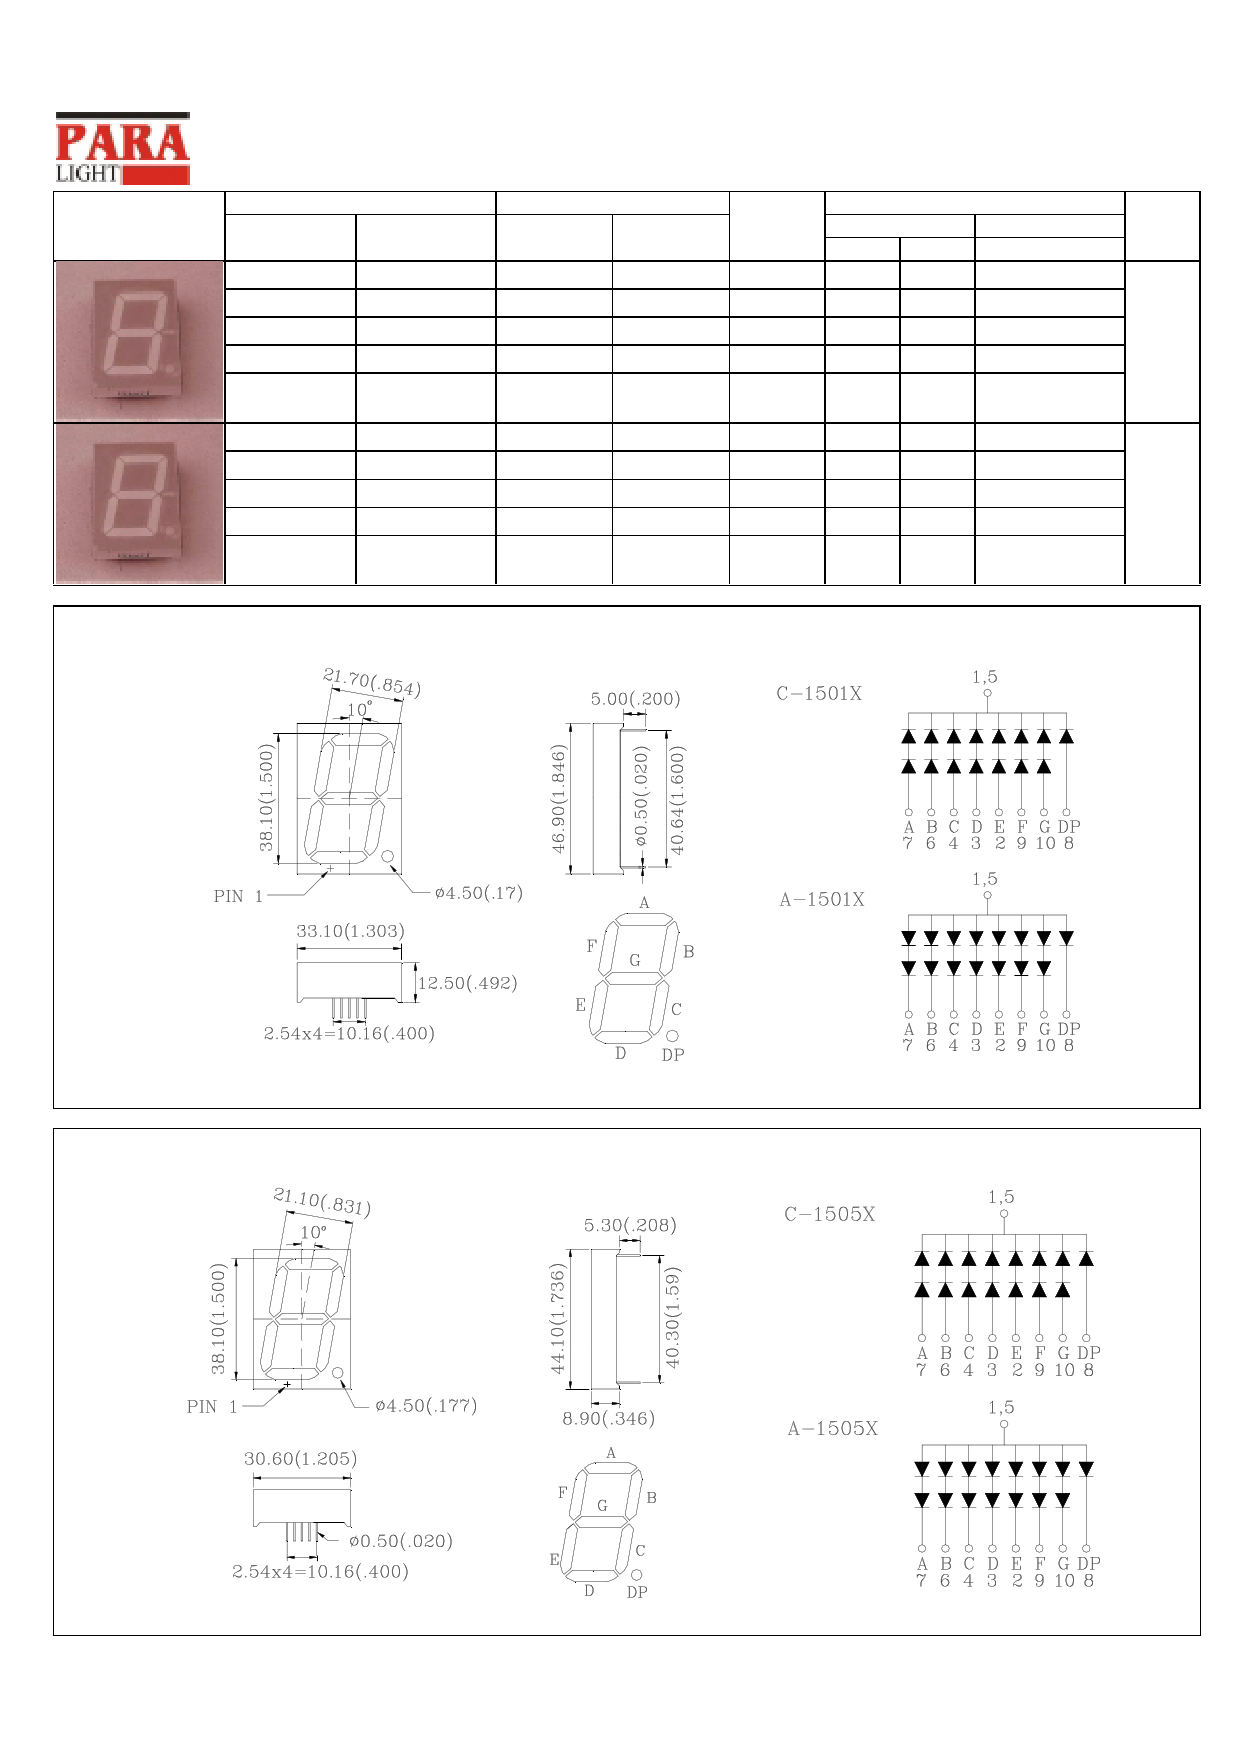 C-1501H datasheet